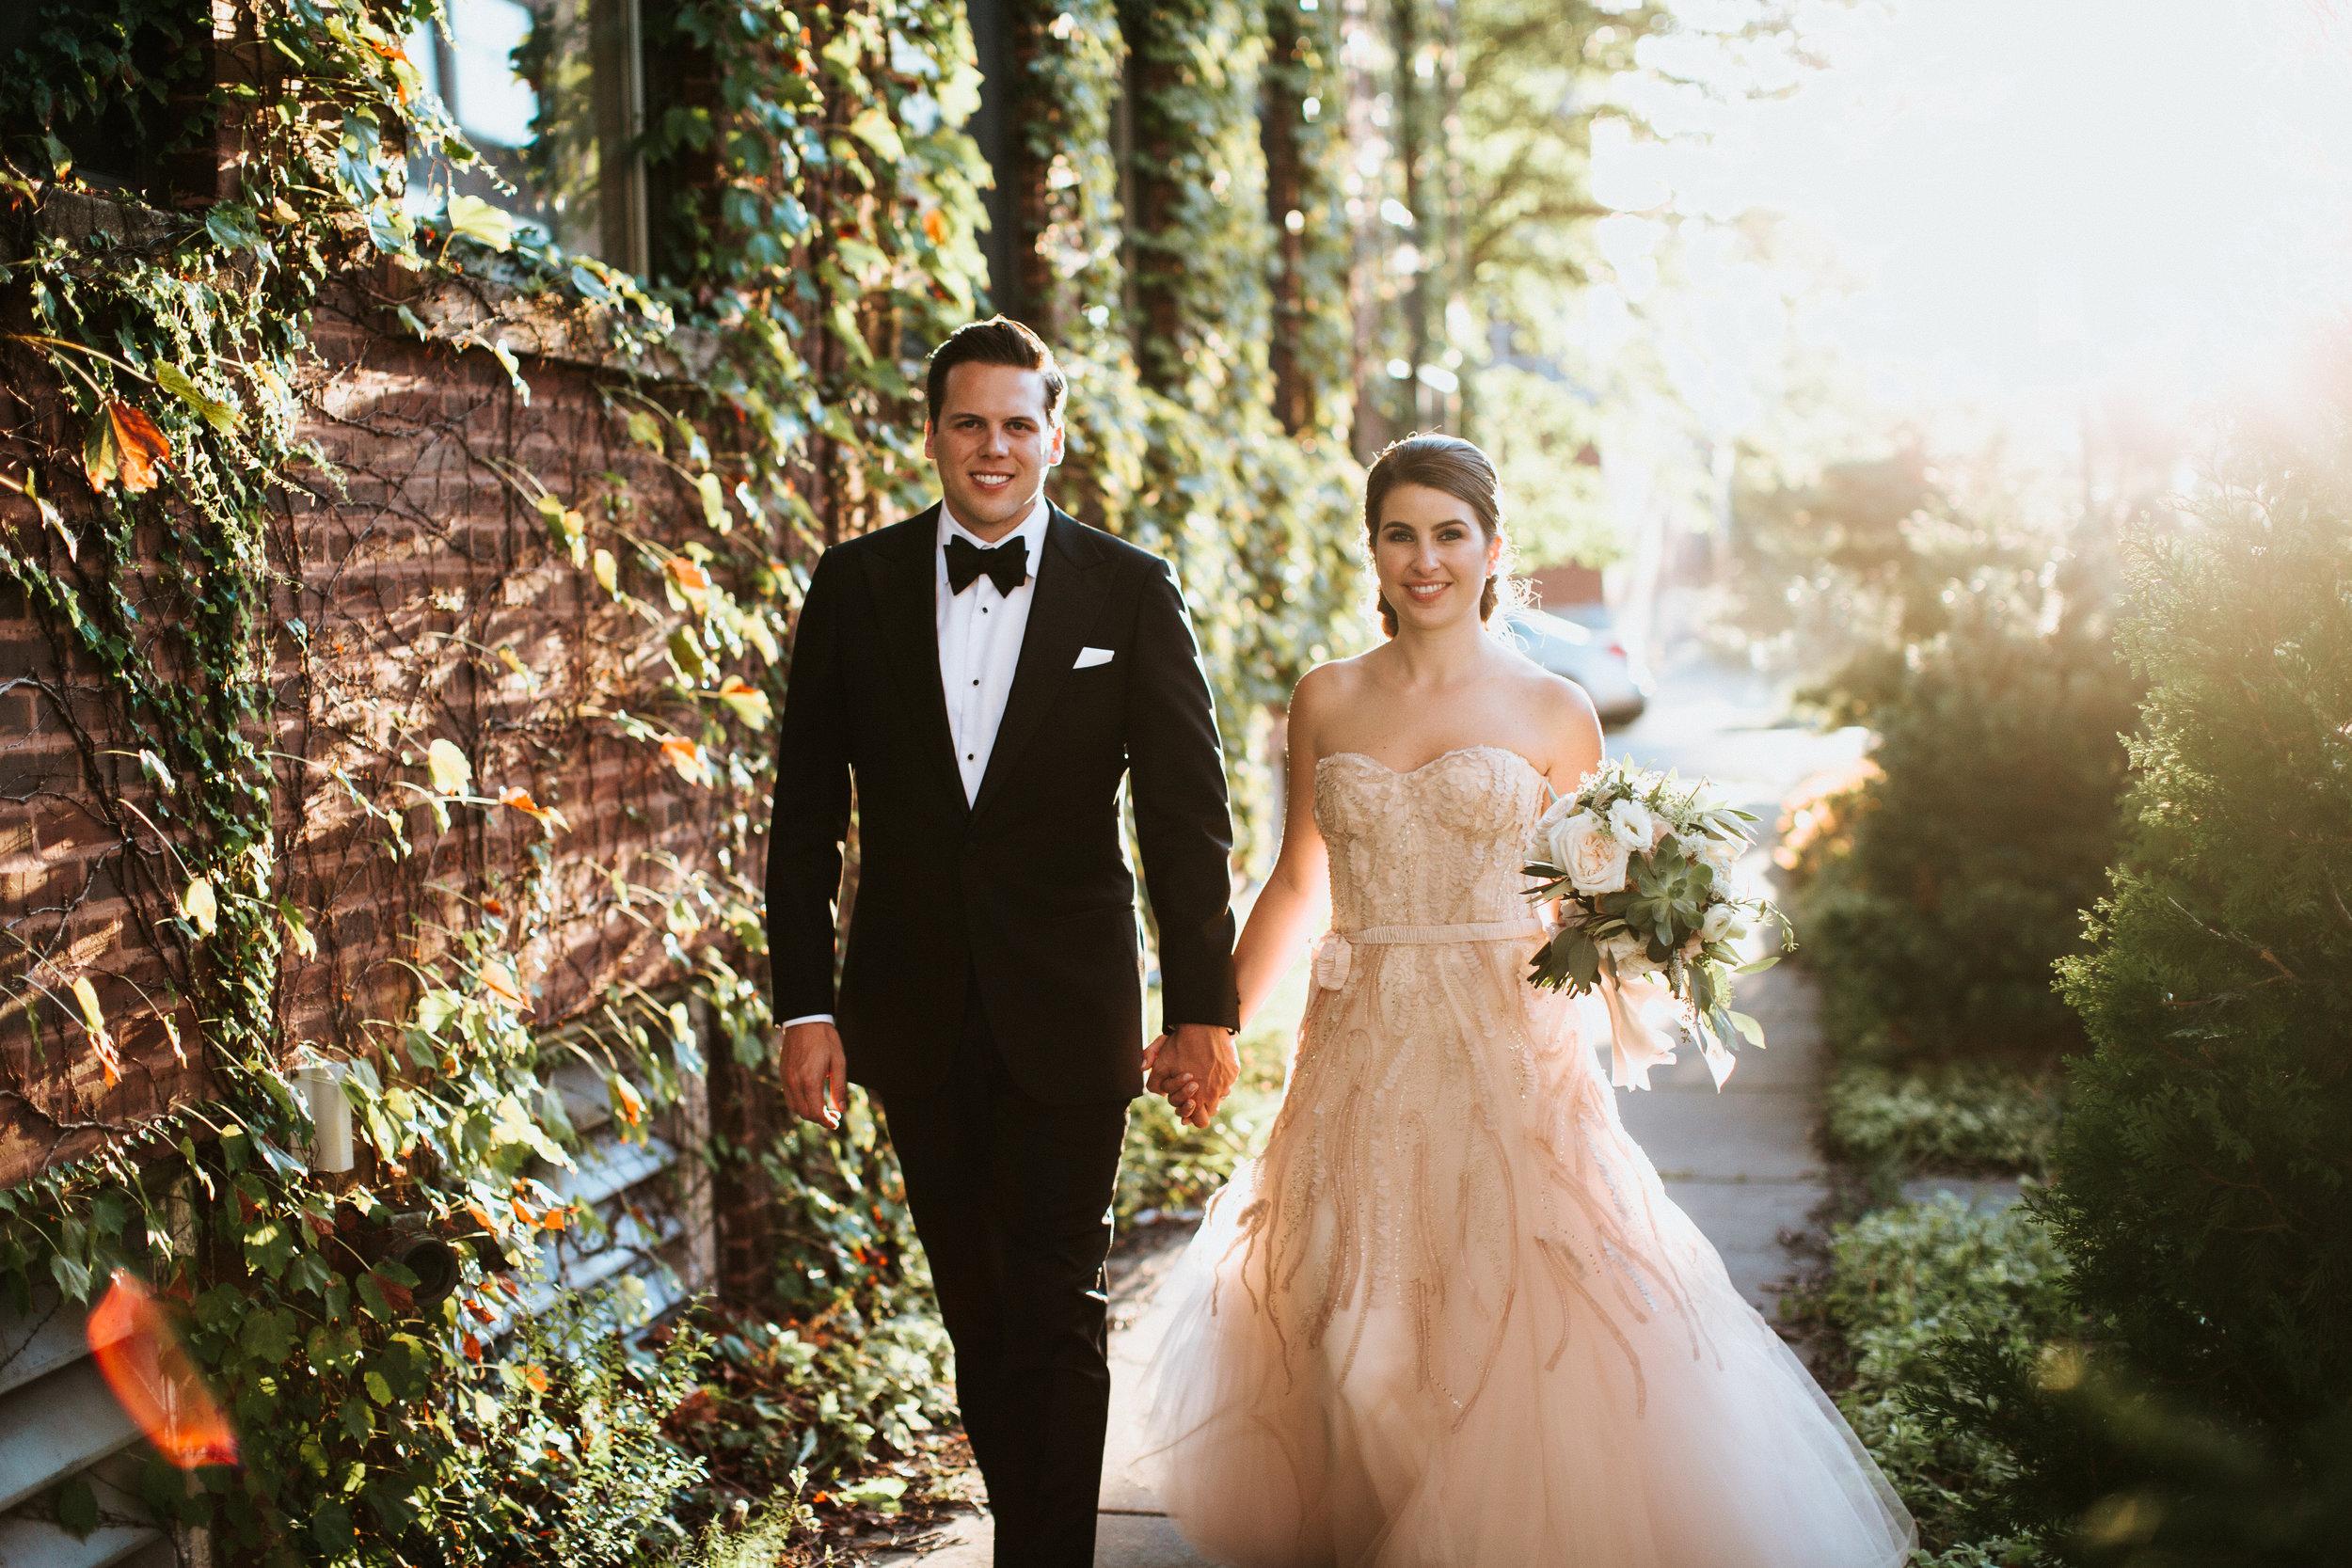 LJ-Wedding-(TODD_JAMES_PHOTOGRAPHY)-36.jpg